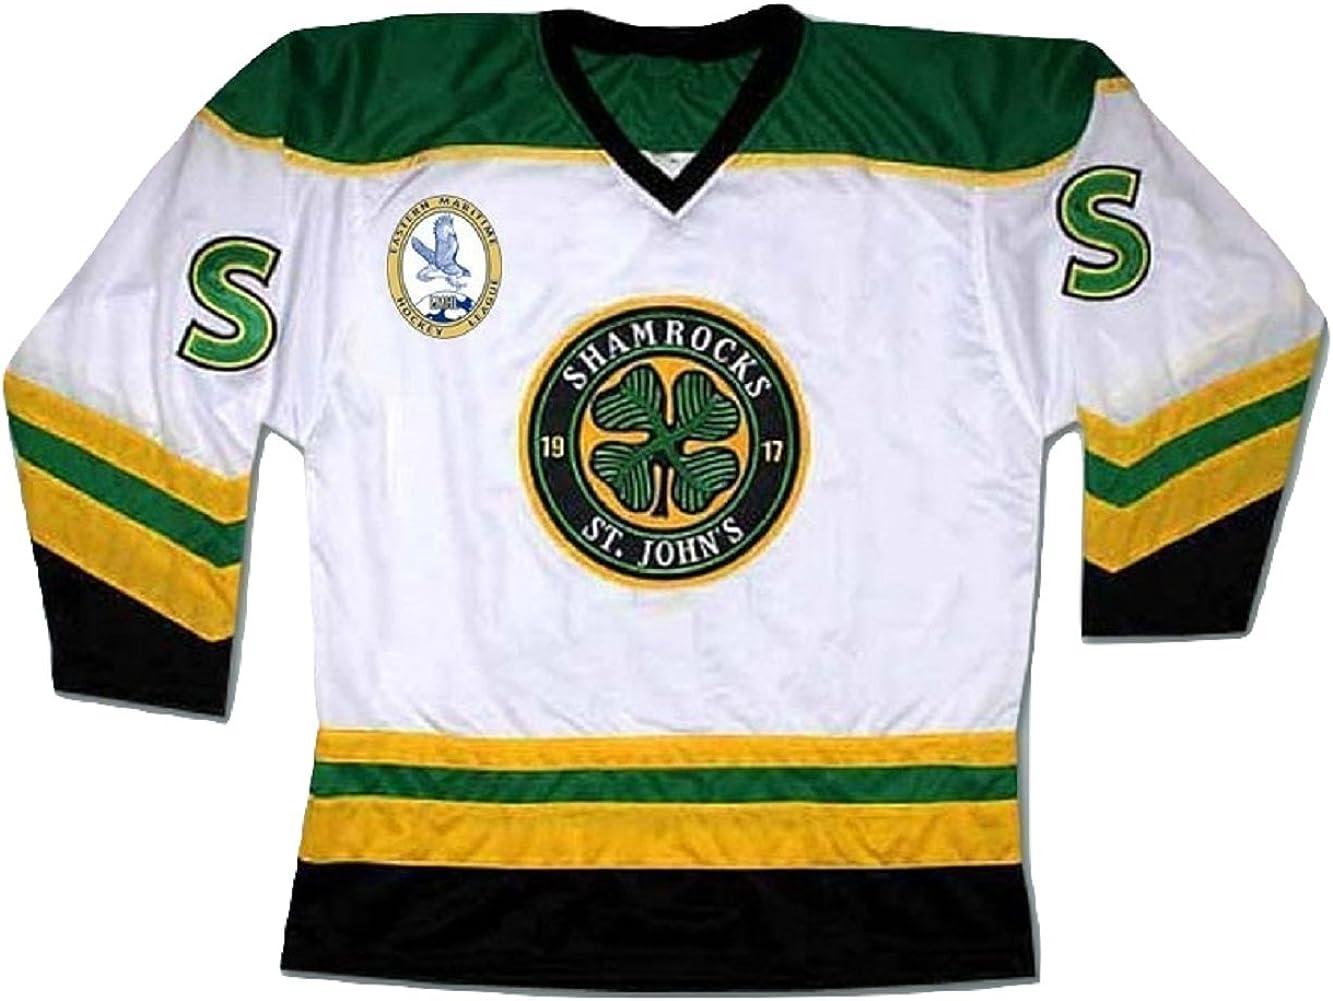 borizcustoms Ross The Boss Rhea ST Johns Shamrocks Hockey Jersey with EMHL Patch Stitch